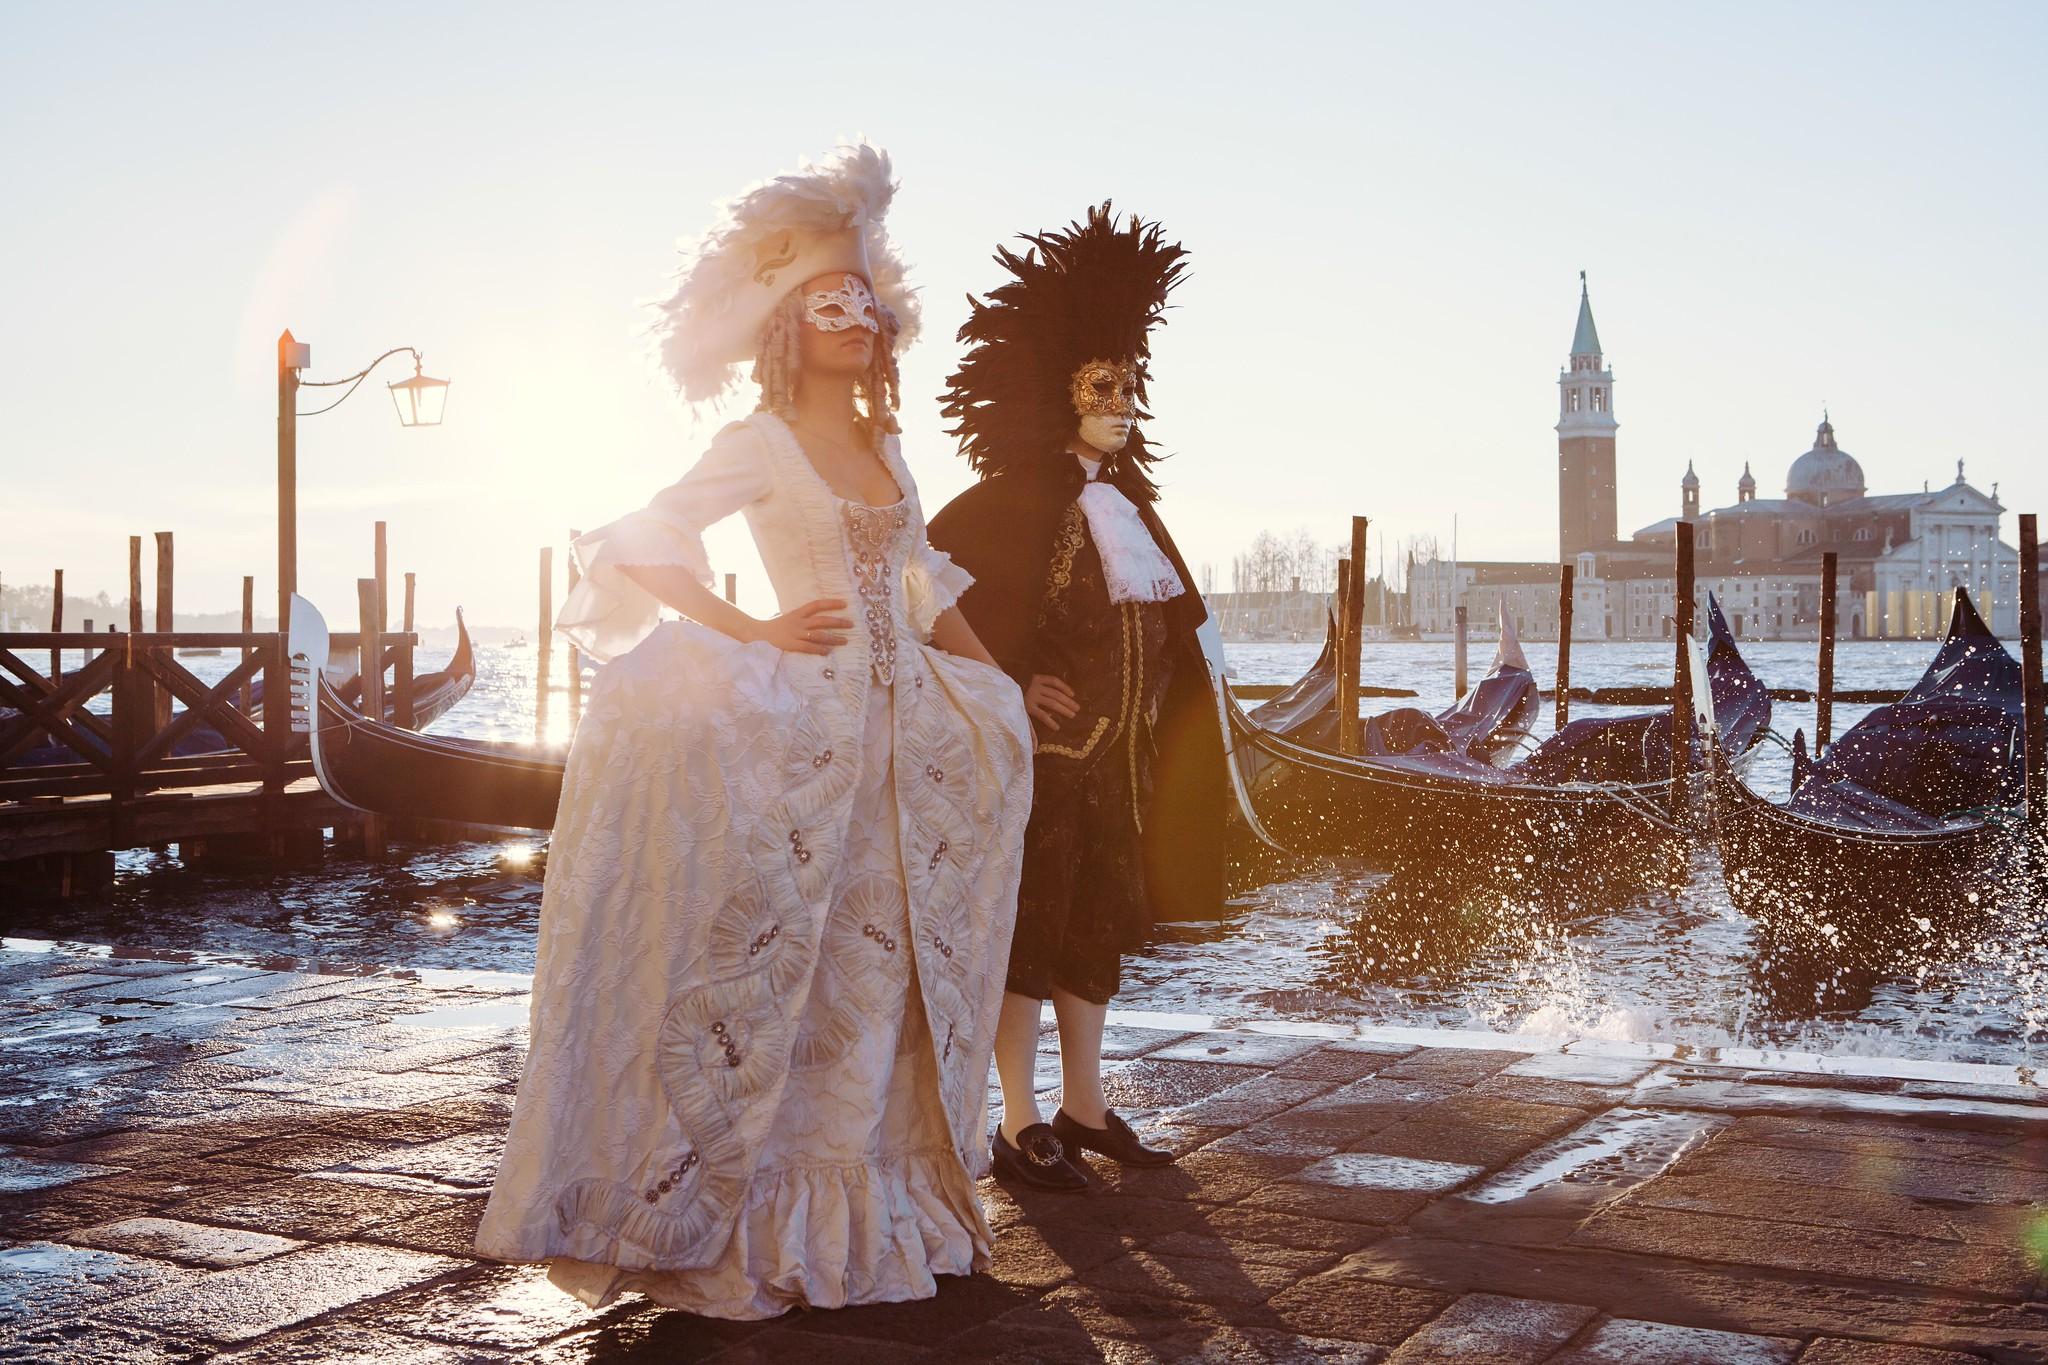 Immersive shooting in Venice: Venice Under Paris